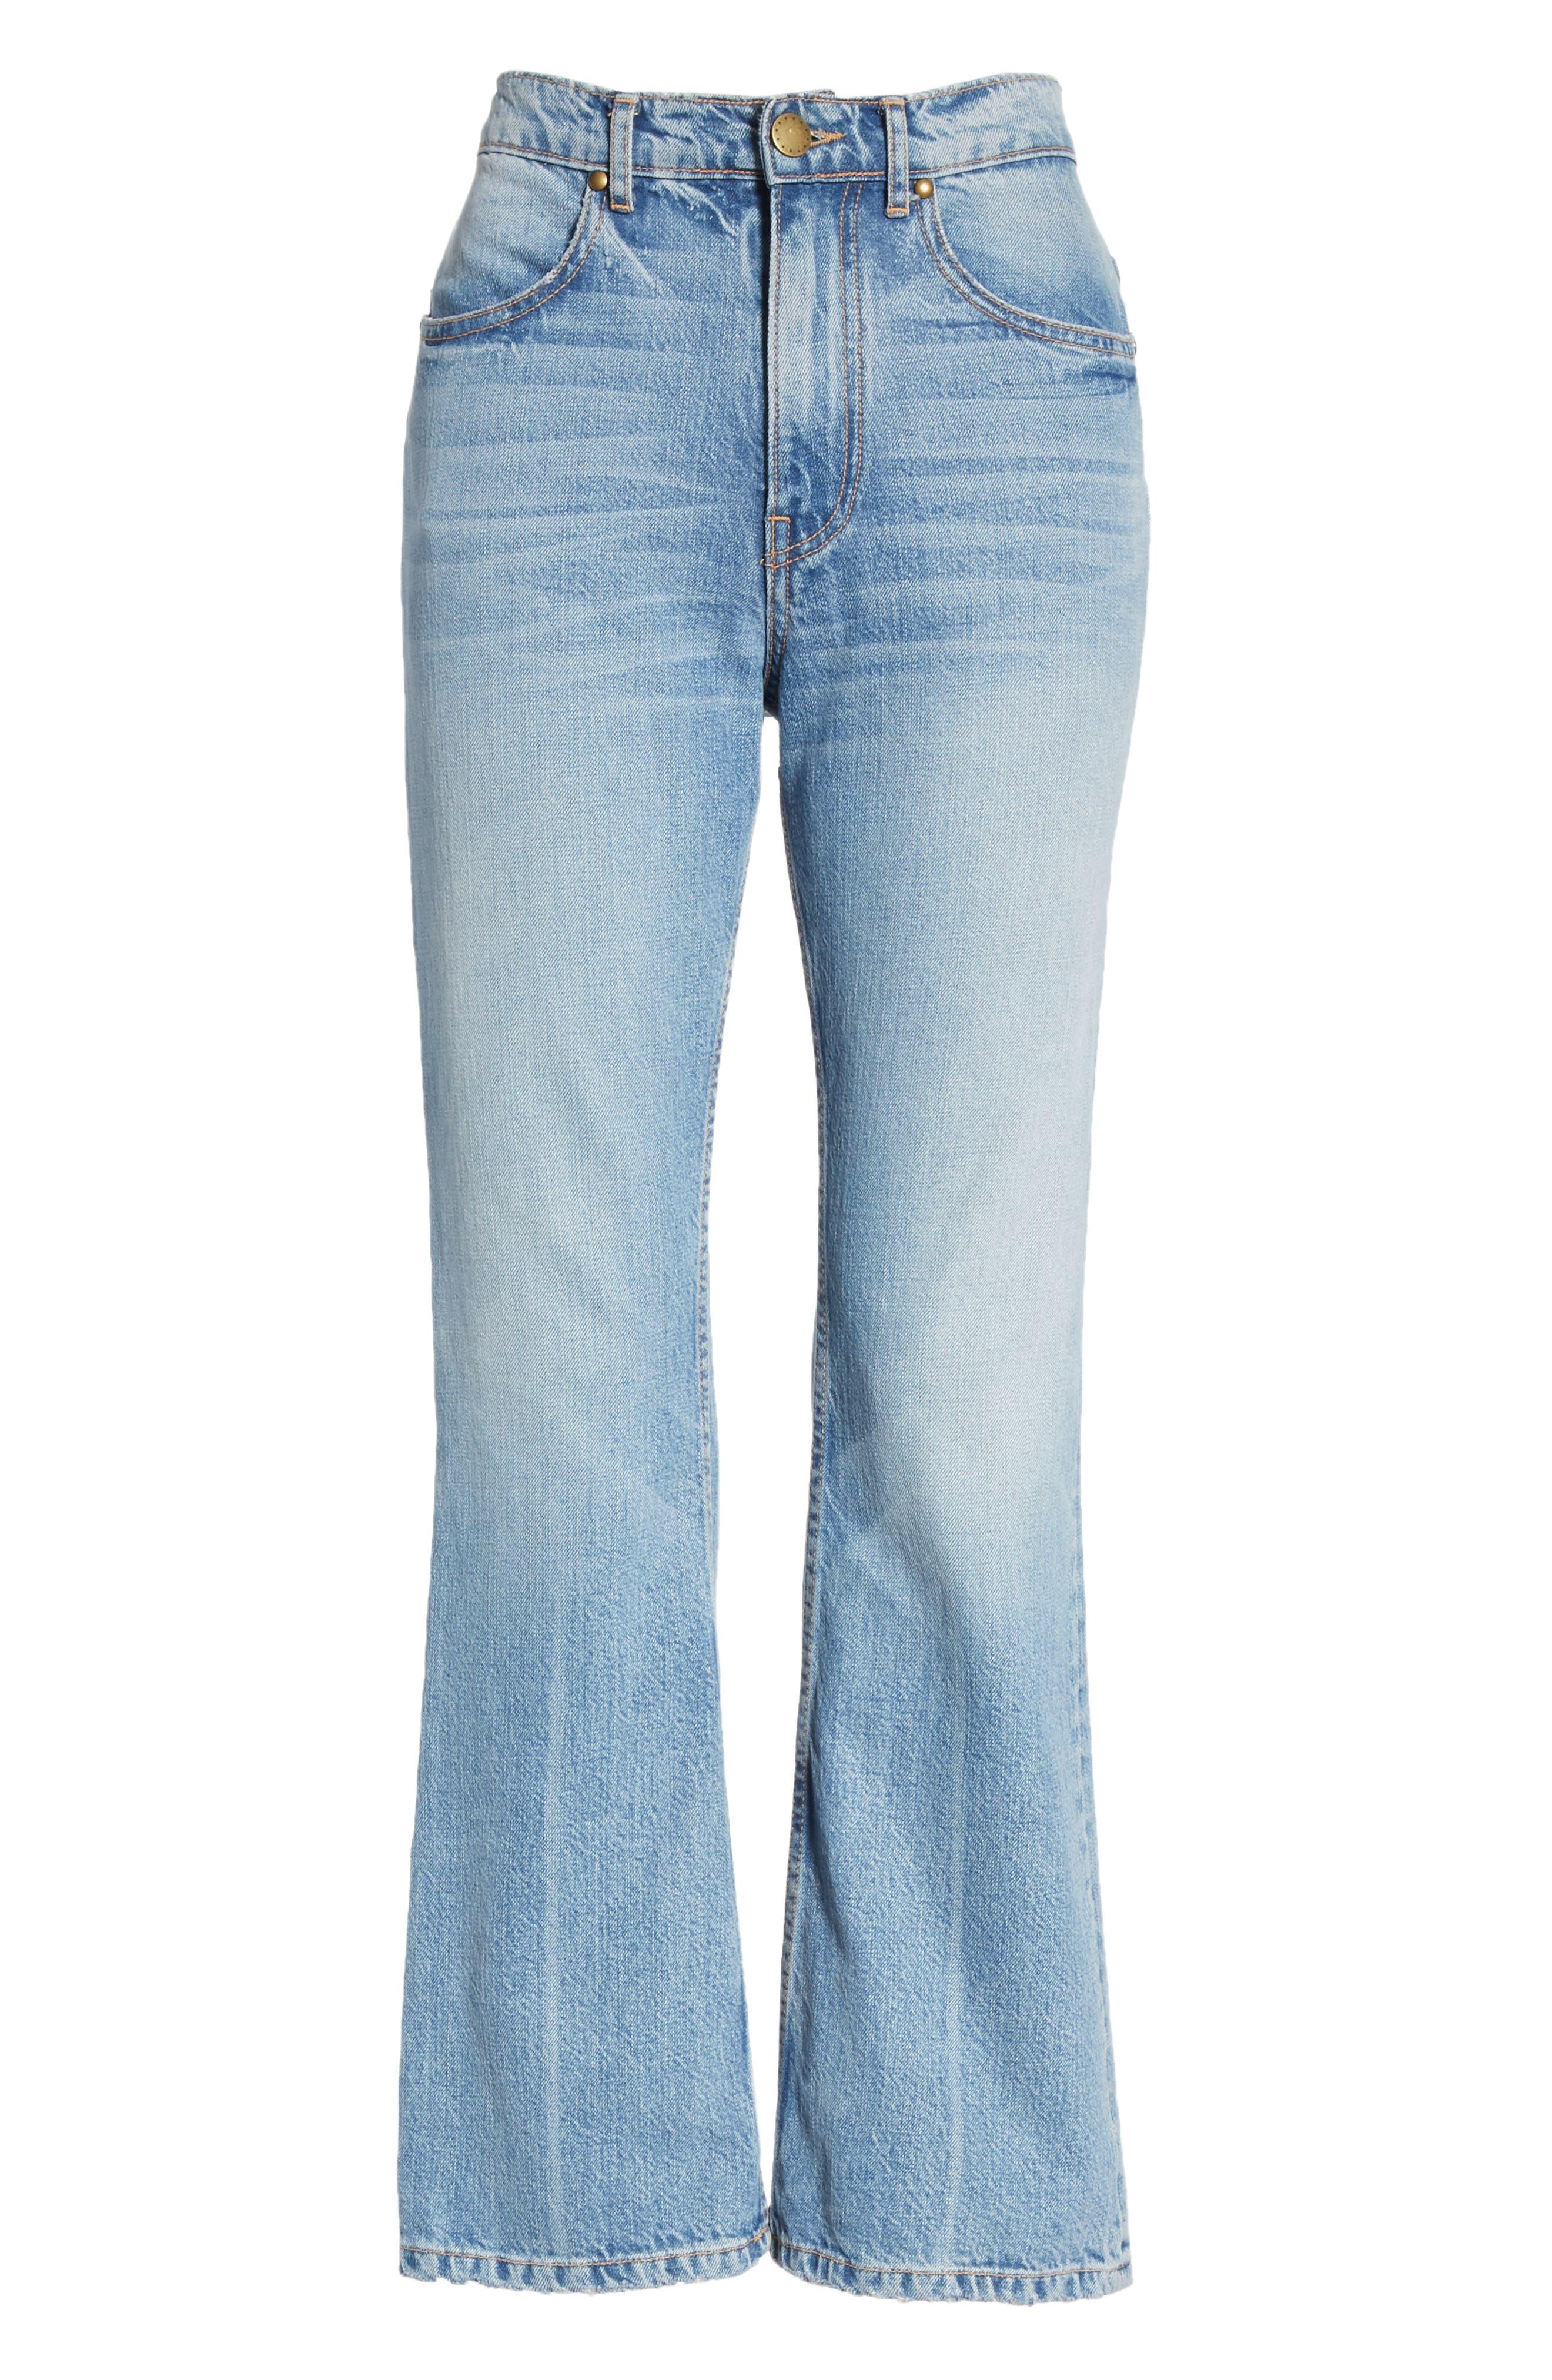 Western Crop Bootcut Jeans,                             Alternate thumbnail 7, color,                             400